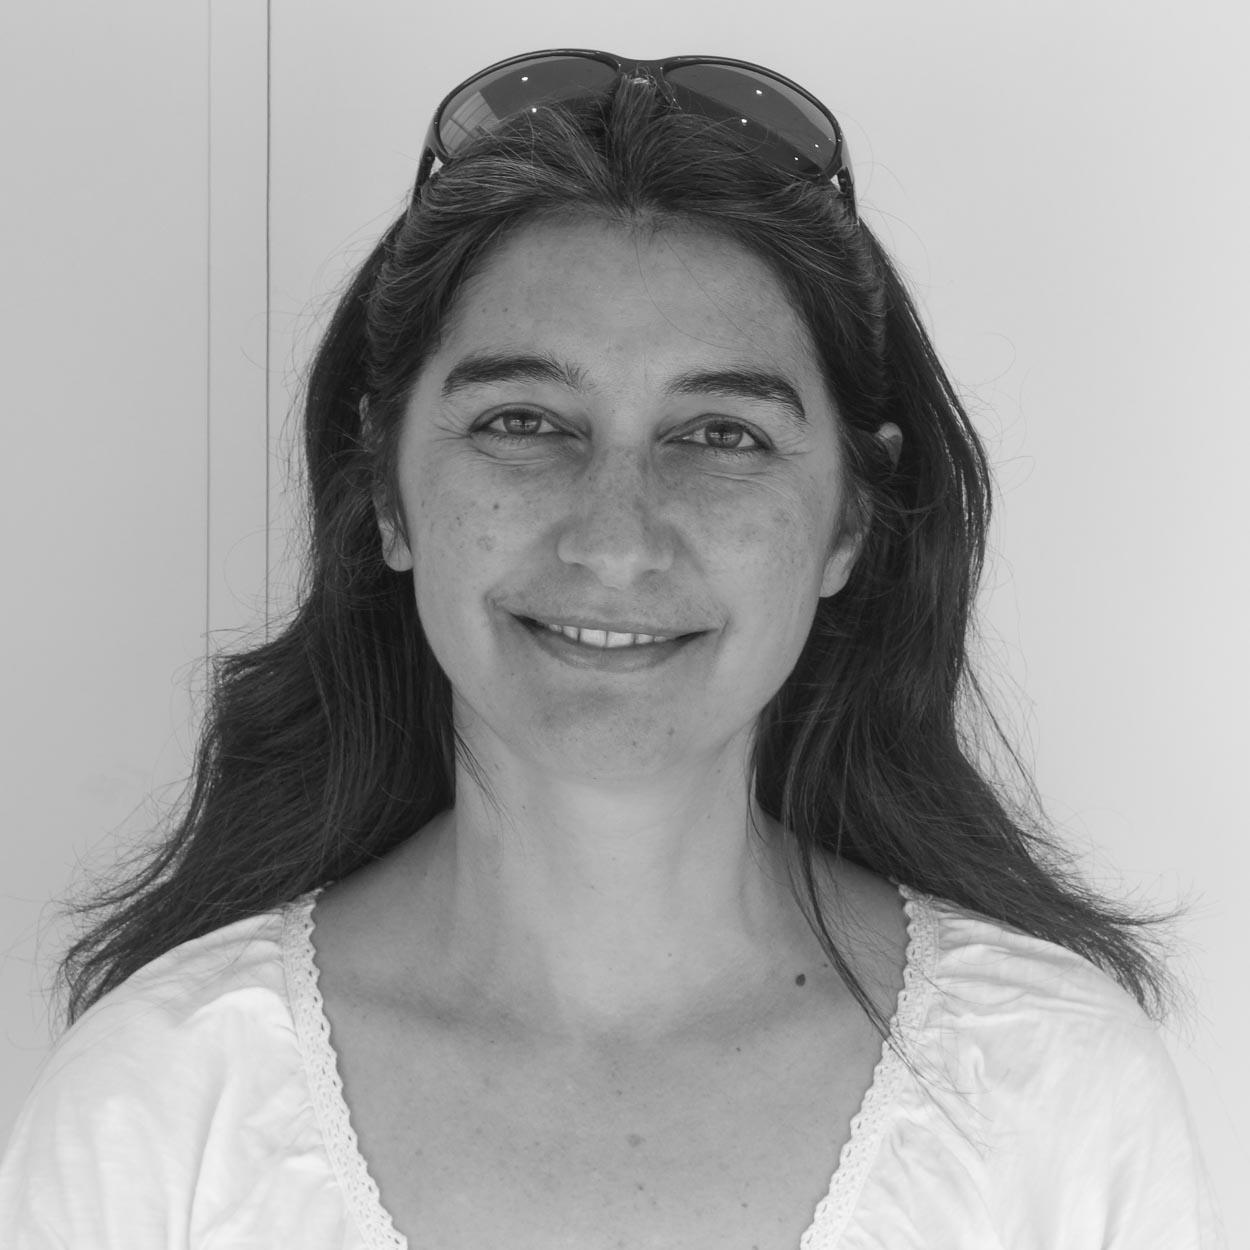 Tania Fernandes